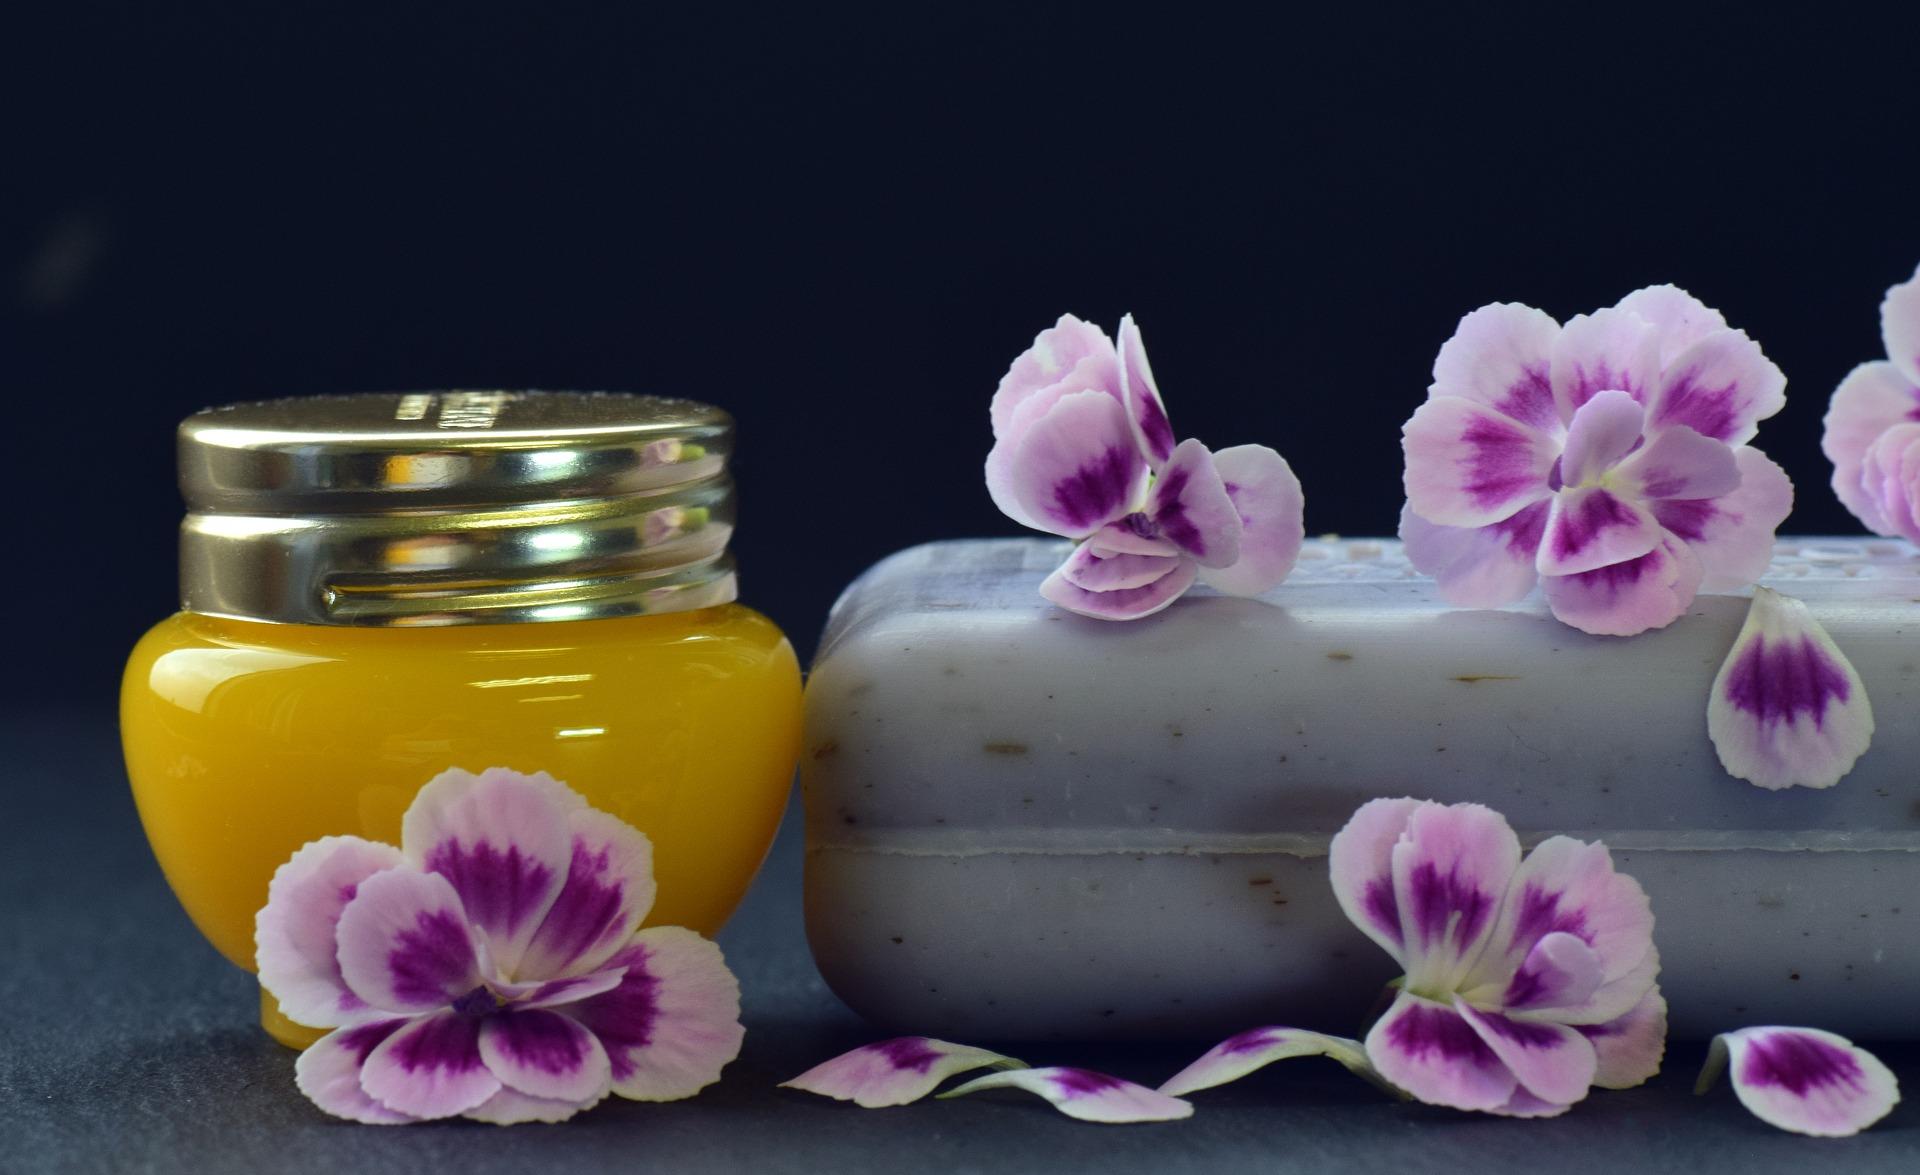 Wallpaper Aromatherapy Background Flower Perfume Treatment 1920x1175 Nextsummer 1678349 Hd Wallpapers Wallhere